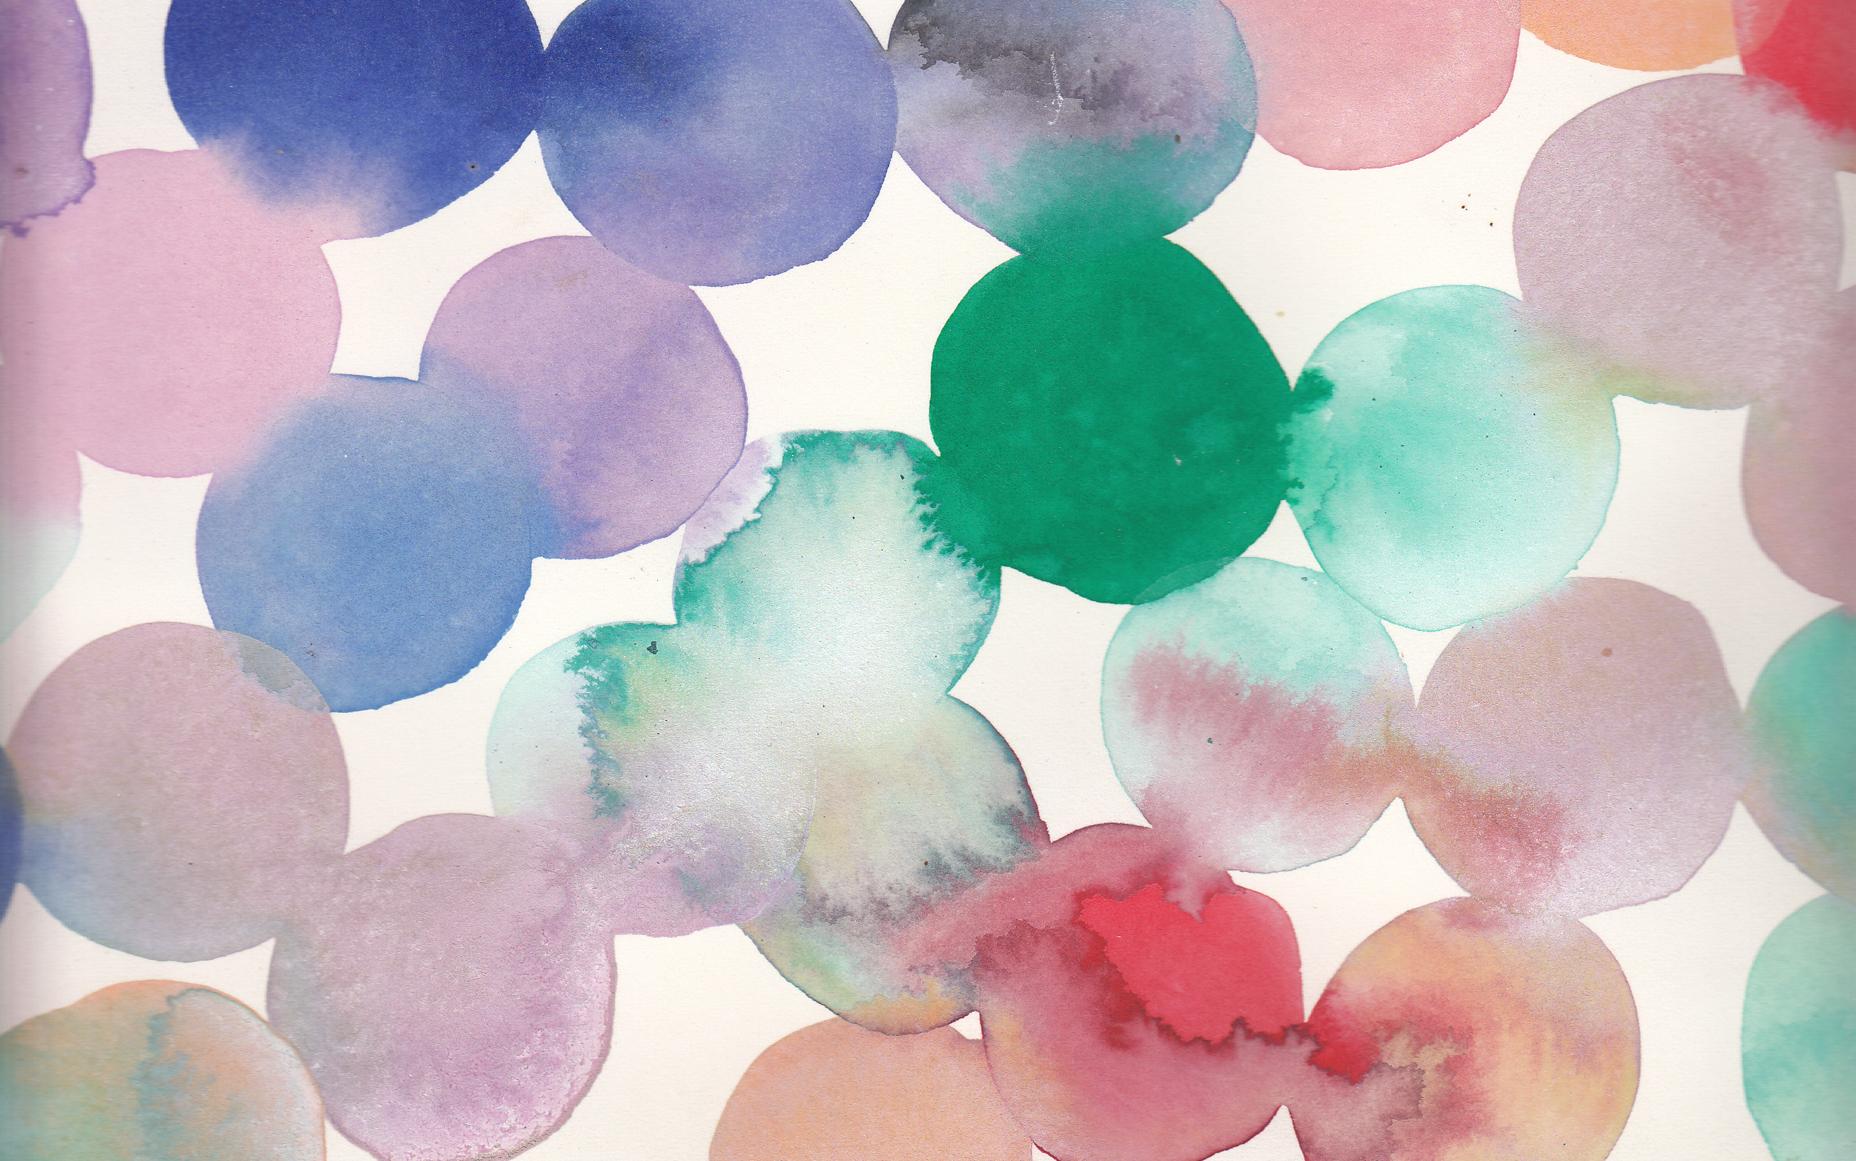 Emily Green For Design Love Fest Wallpaper 3 Peach Watercolour Abbie 39 S Babble